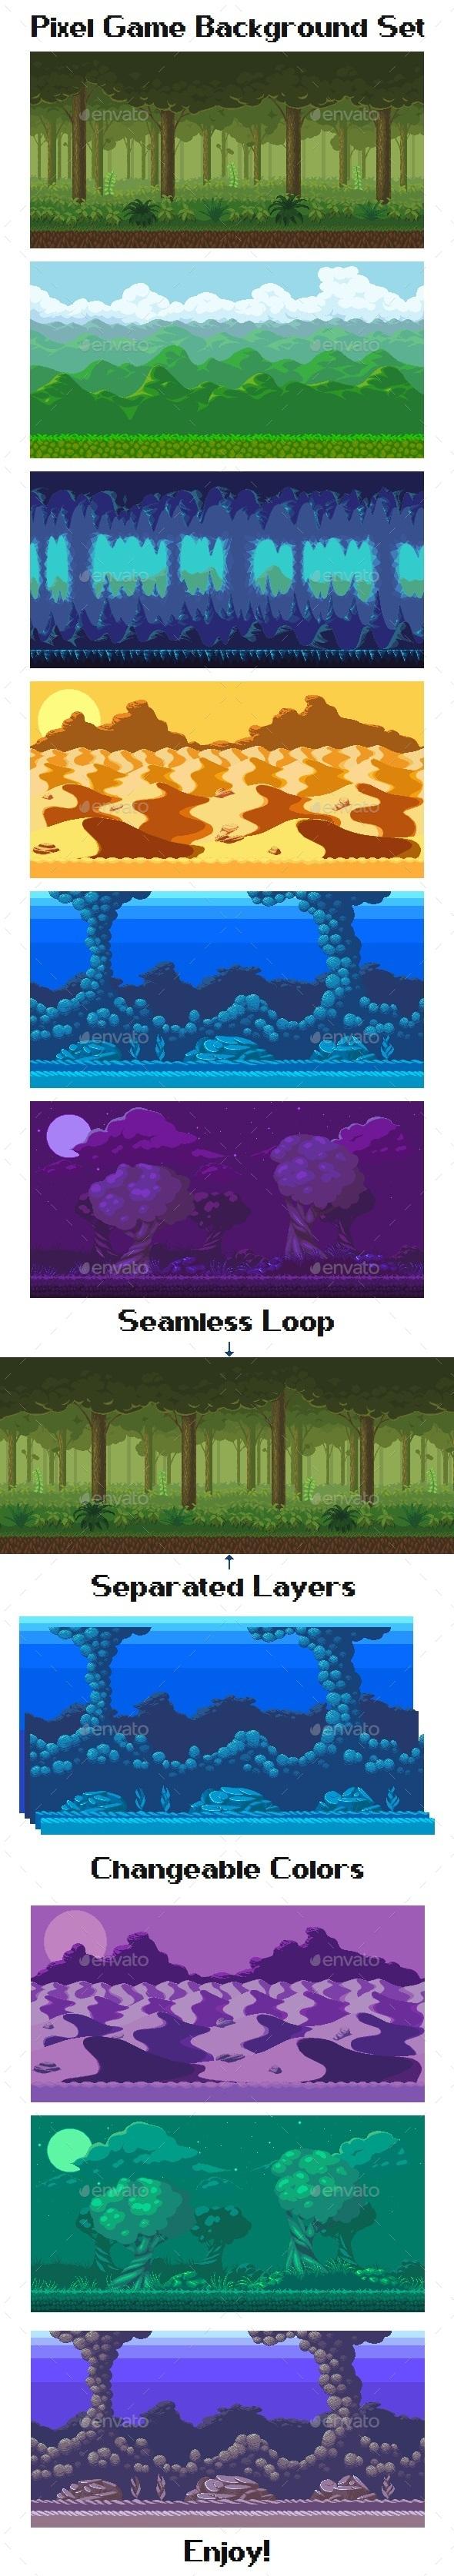 Pixel Game Background Set - Backgrounds Game Assets